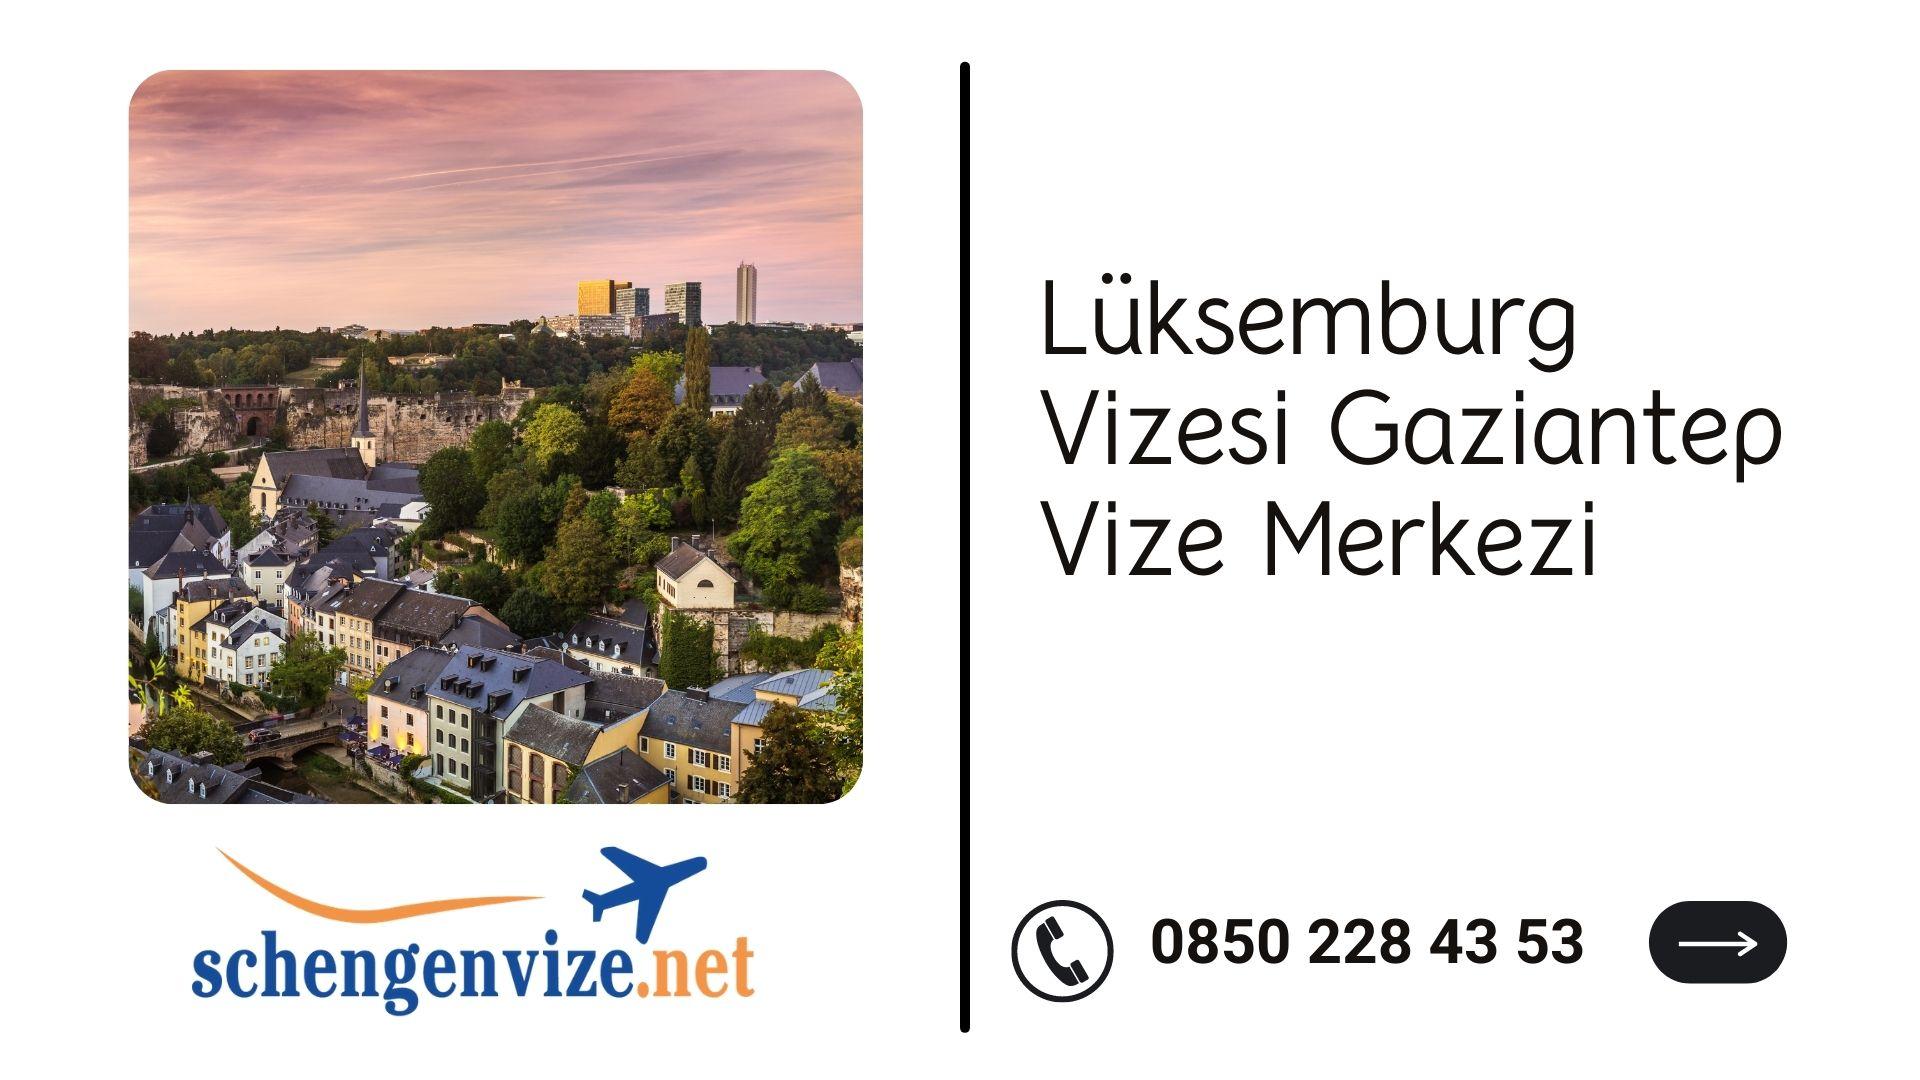 Lüksemburg Vizesi Gaziantep Vize Merkezi